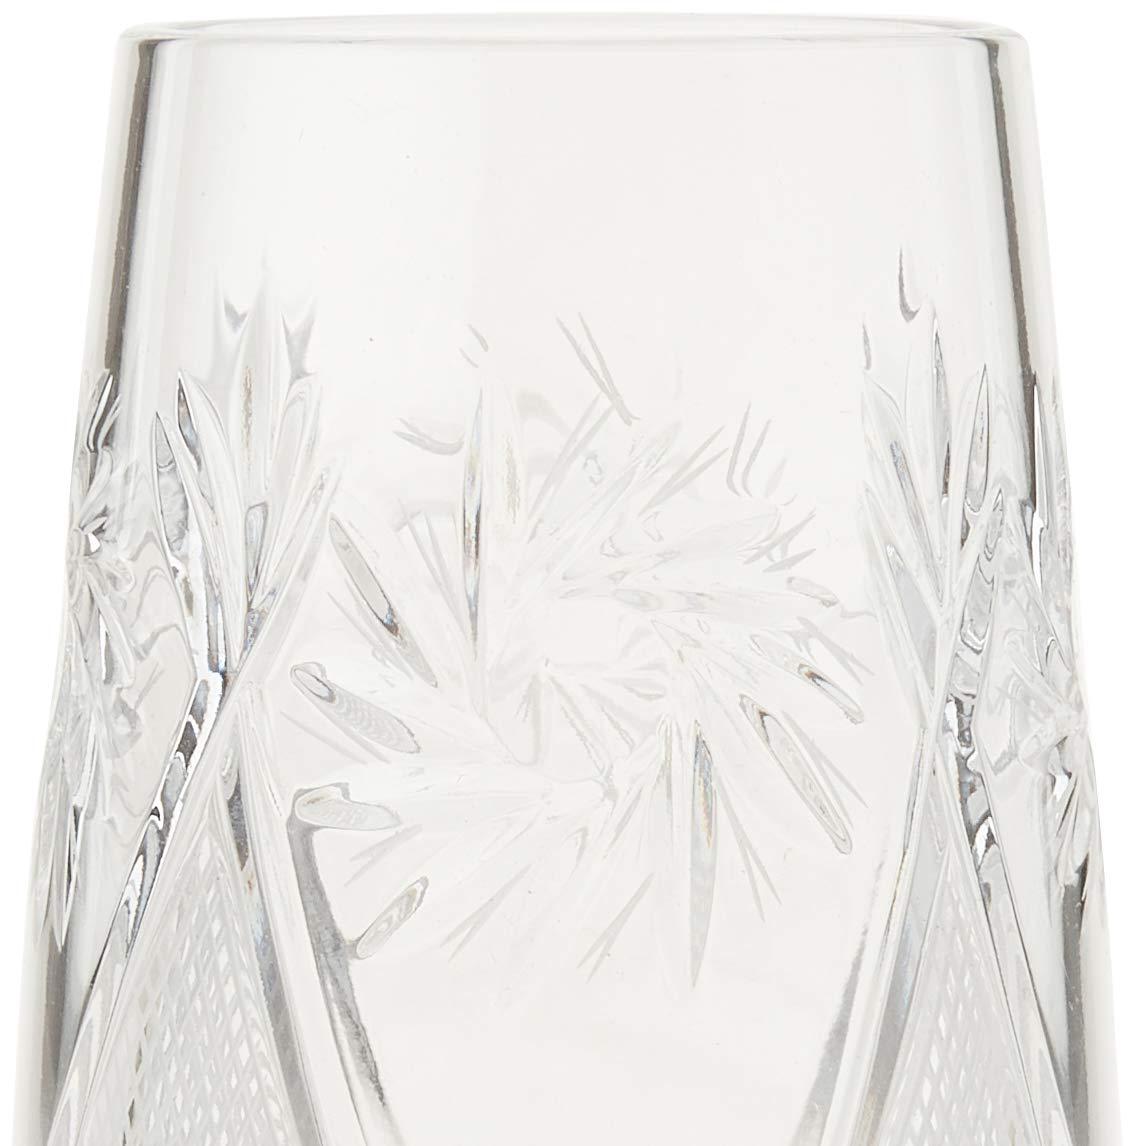 Clear 10 oz Hand Made Vintage Russian Crystal Glass Neman Glassworks GL5108-300 Set of 6